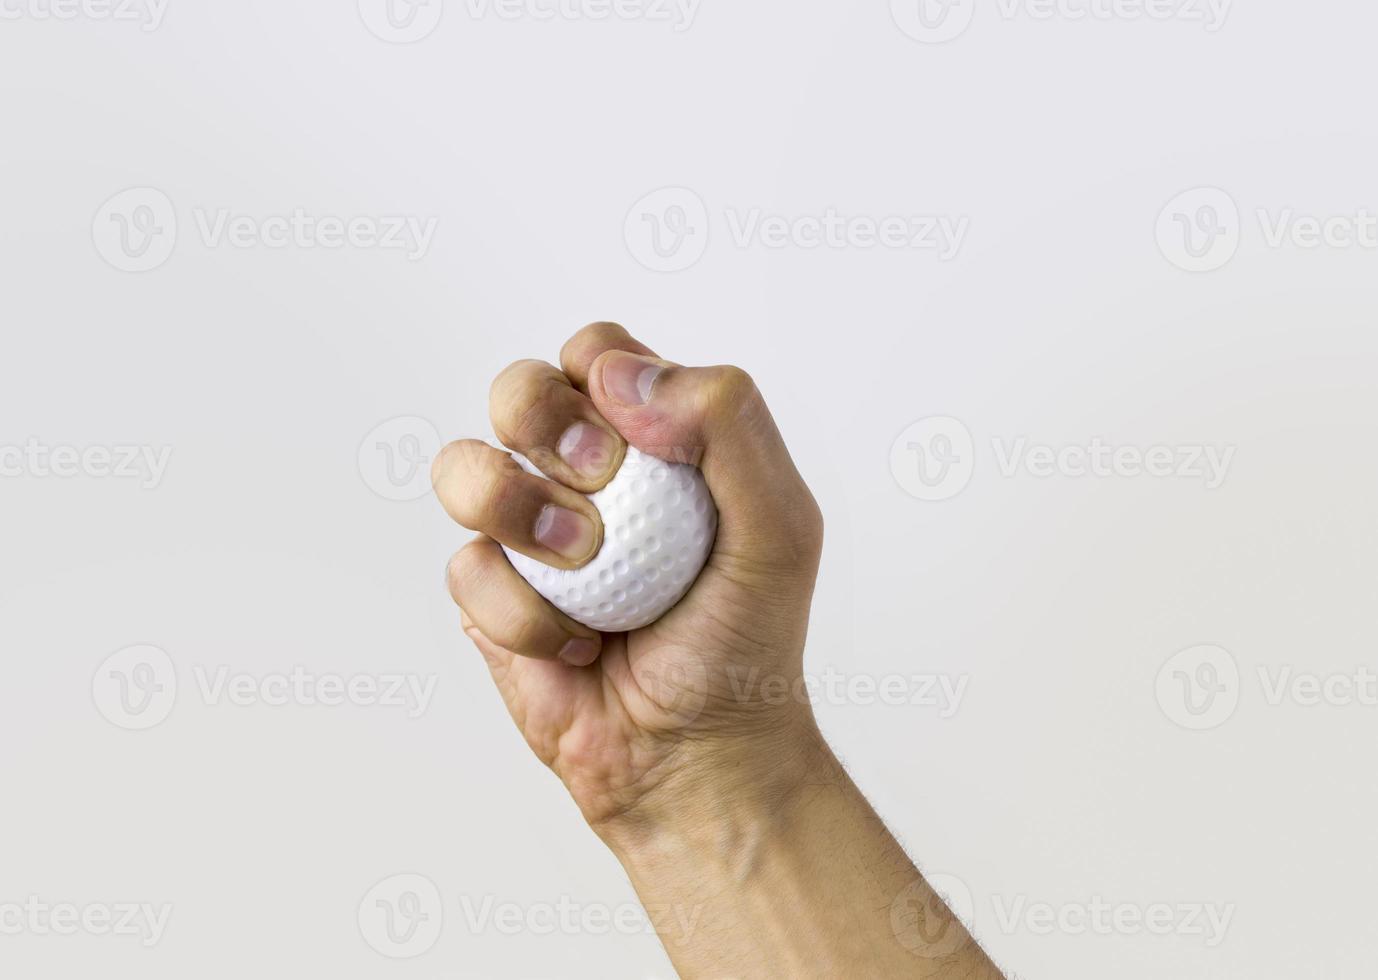 main serrant la balle anti-stress photo